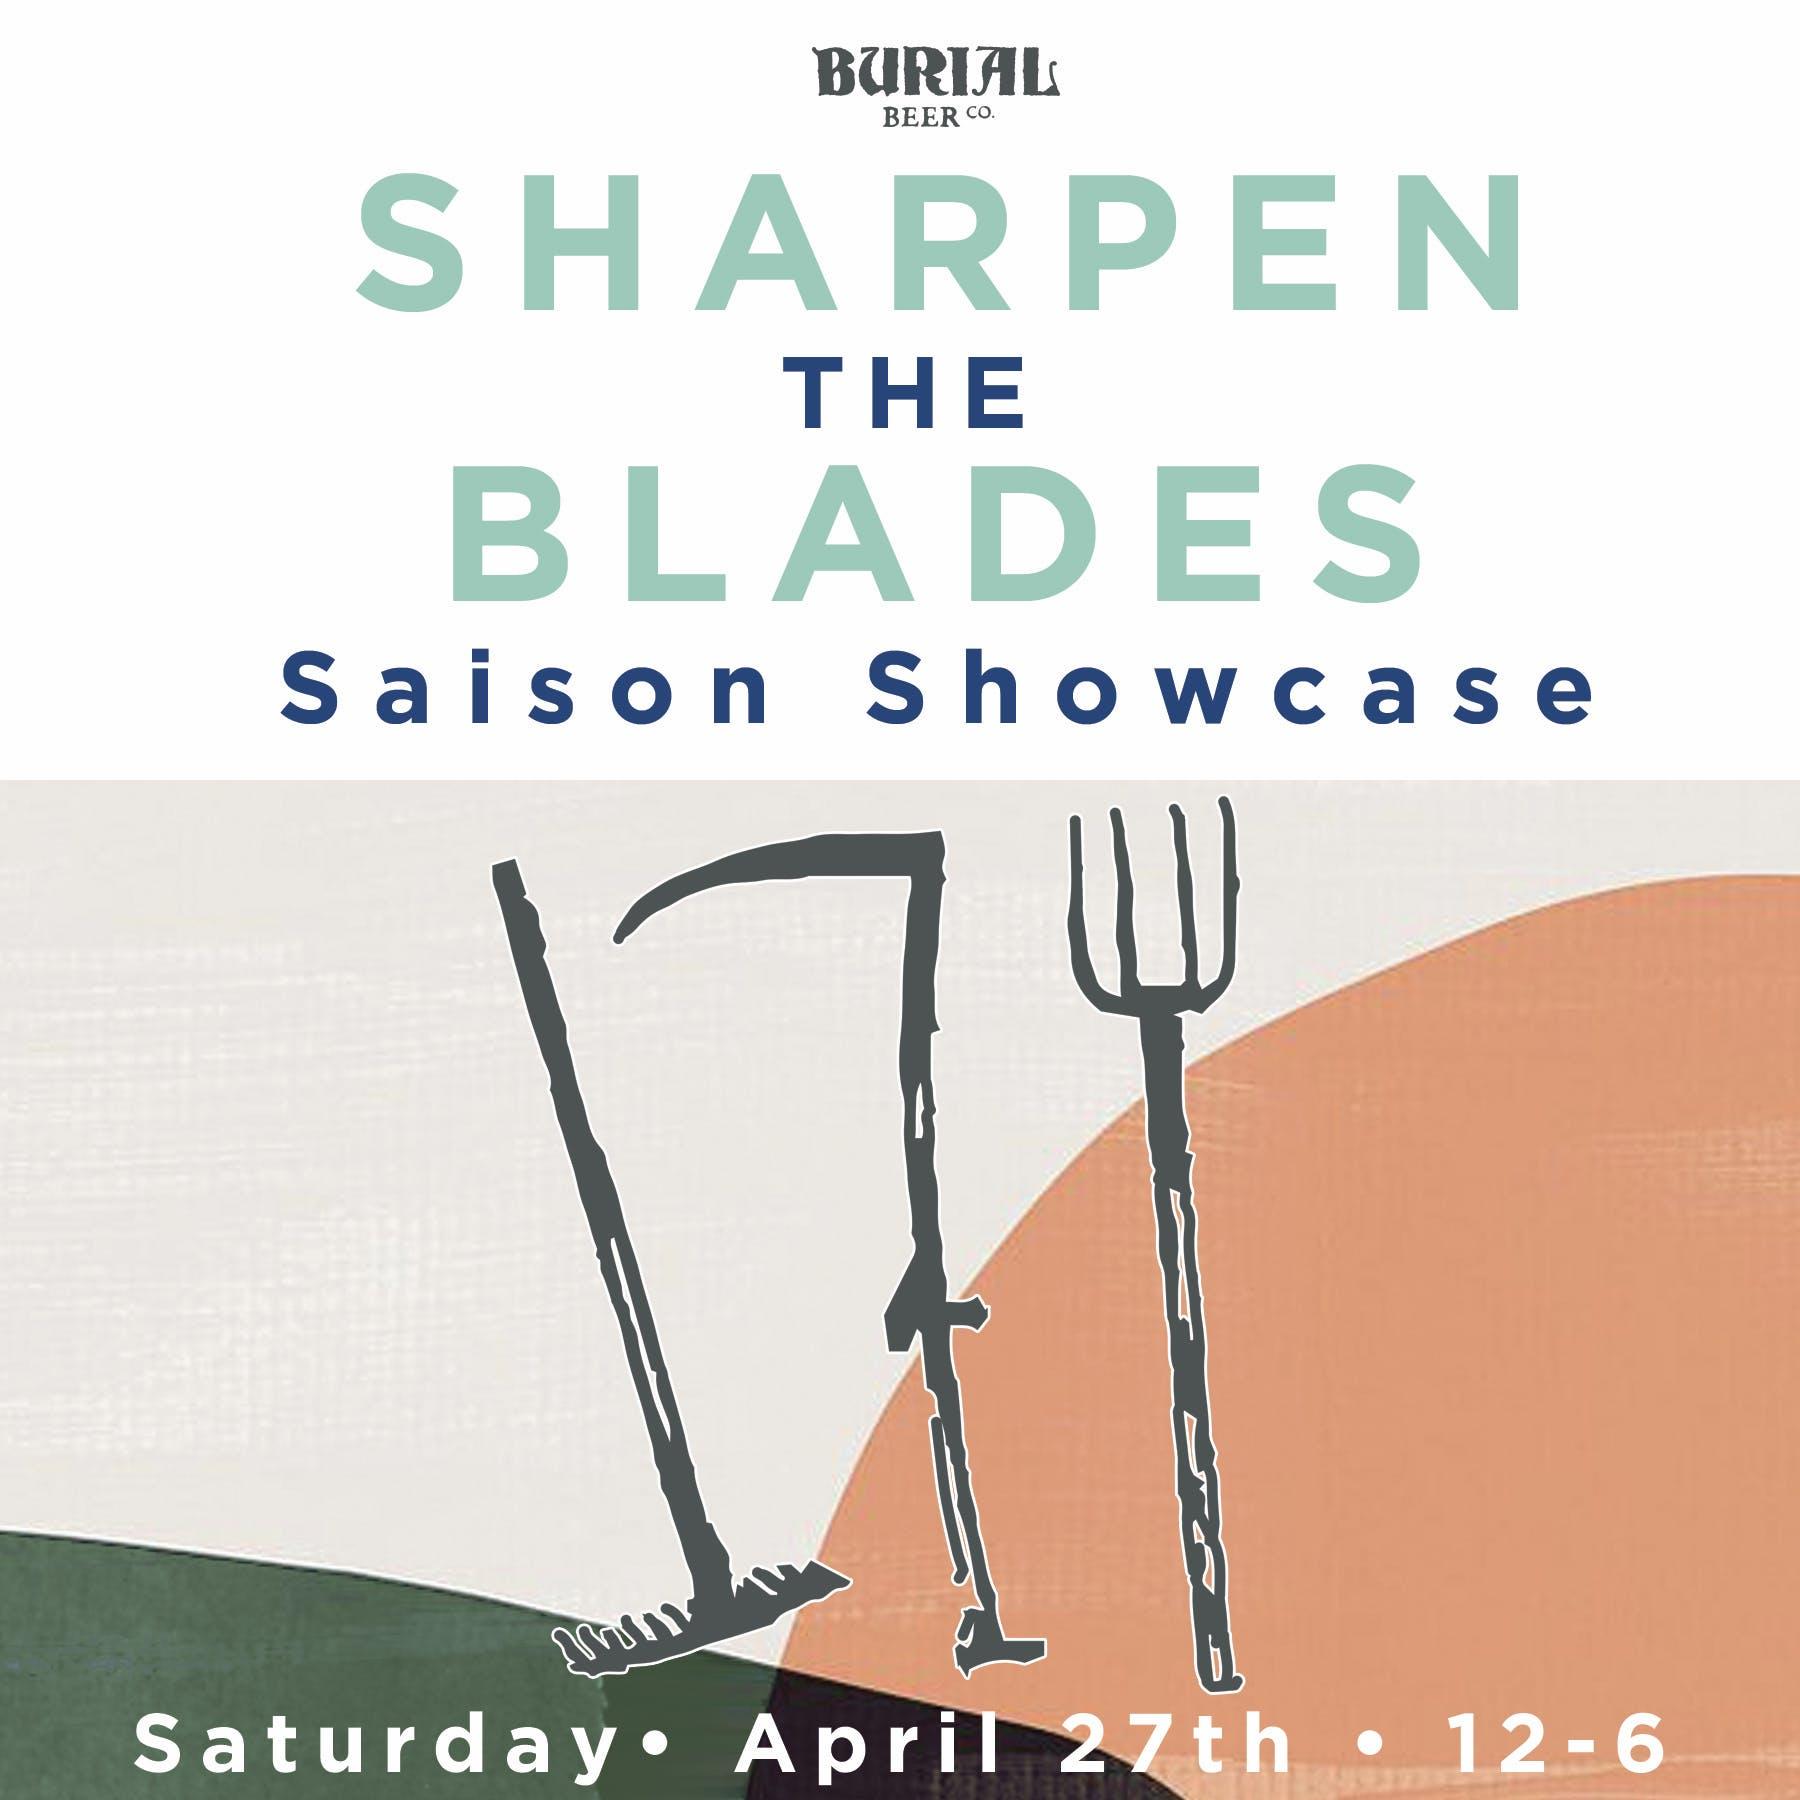 Sharpen the Blade Saison Showcase